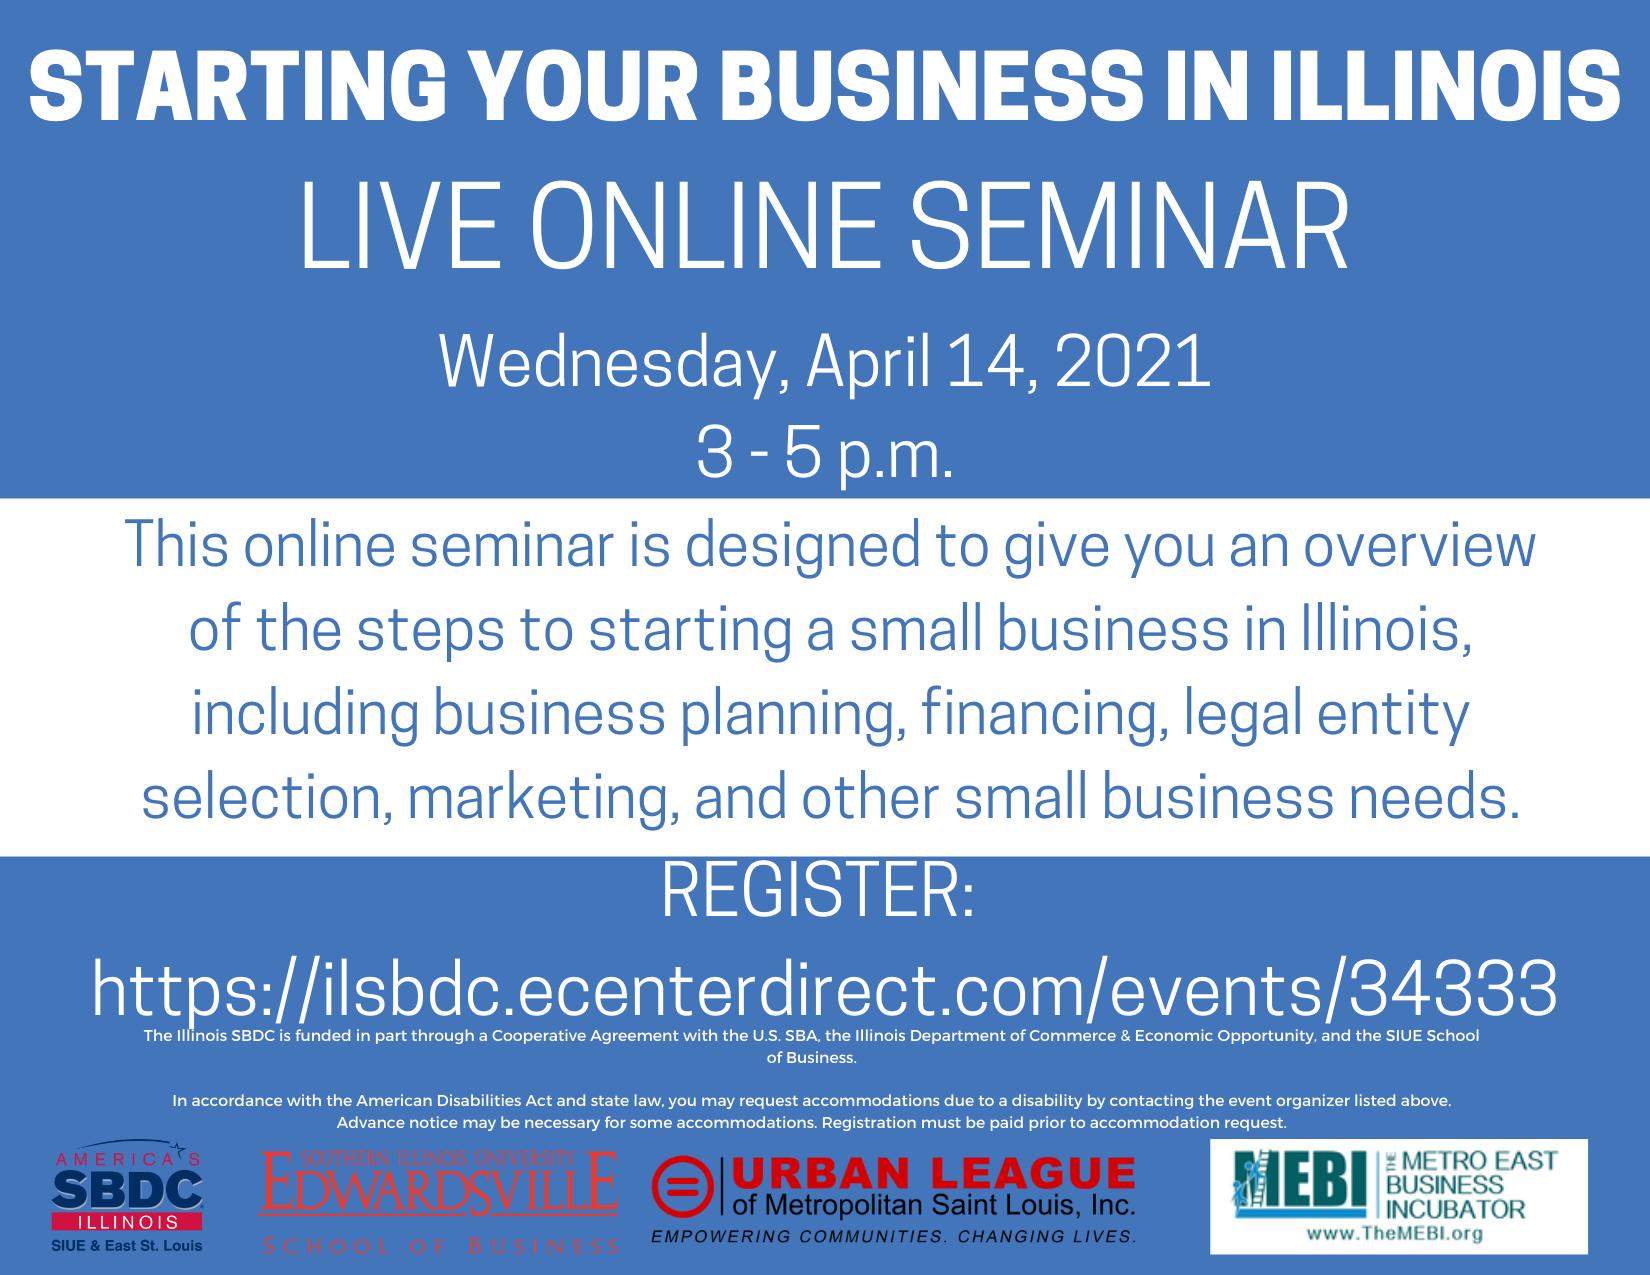 Starting a Small Business in IL  Seminar